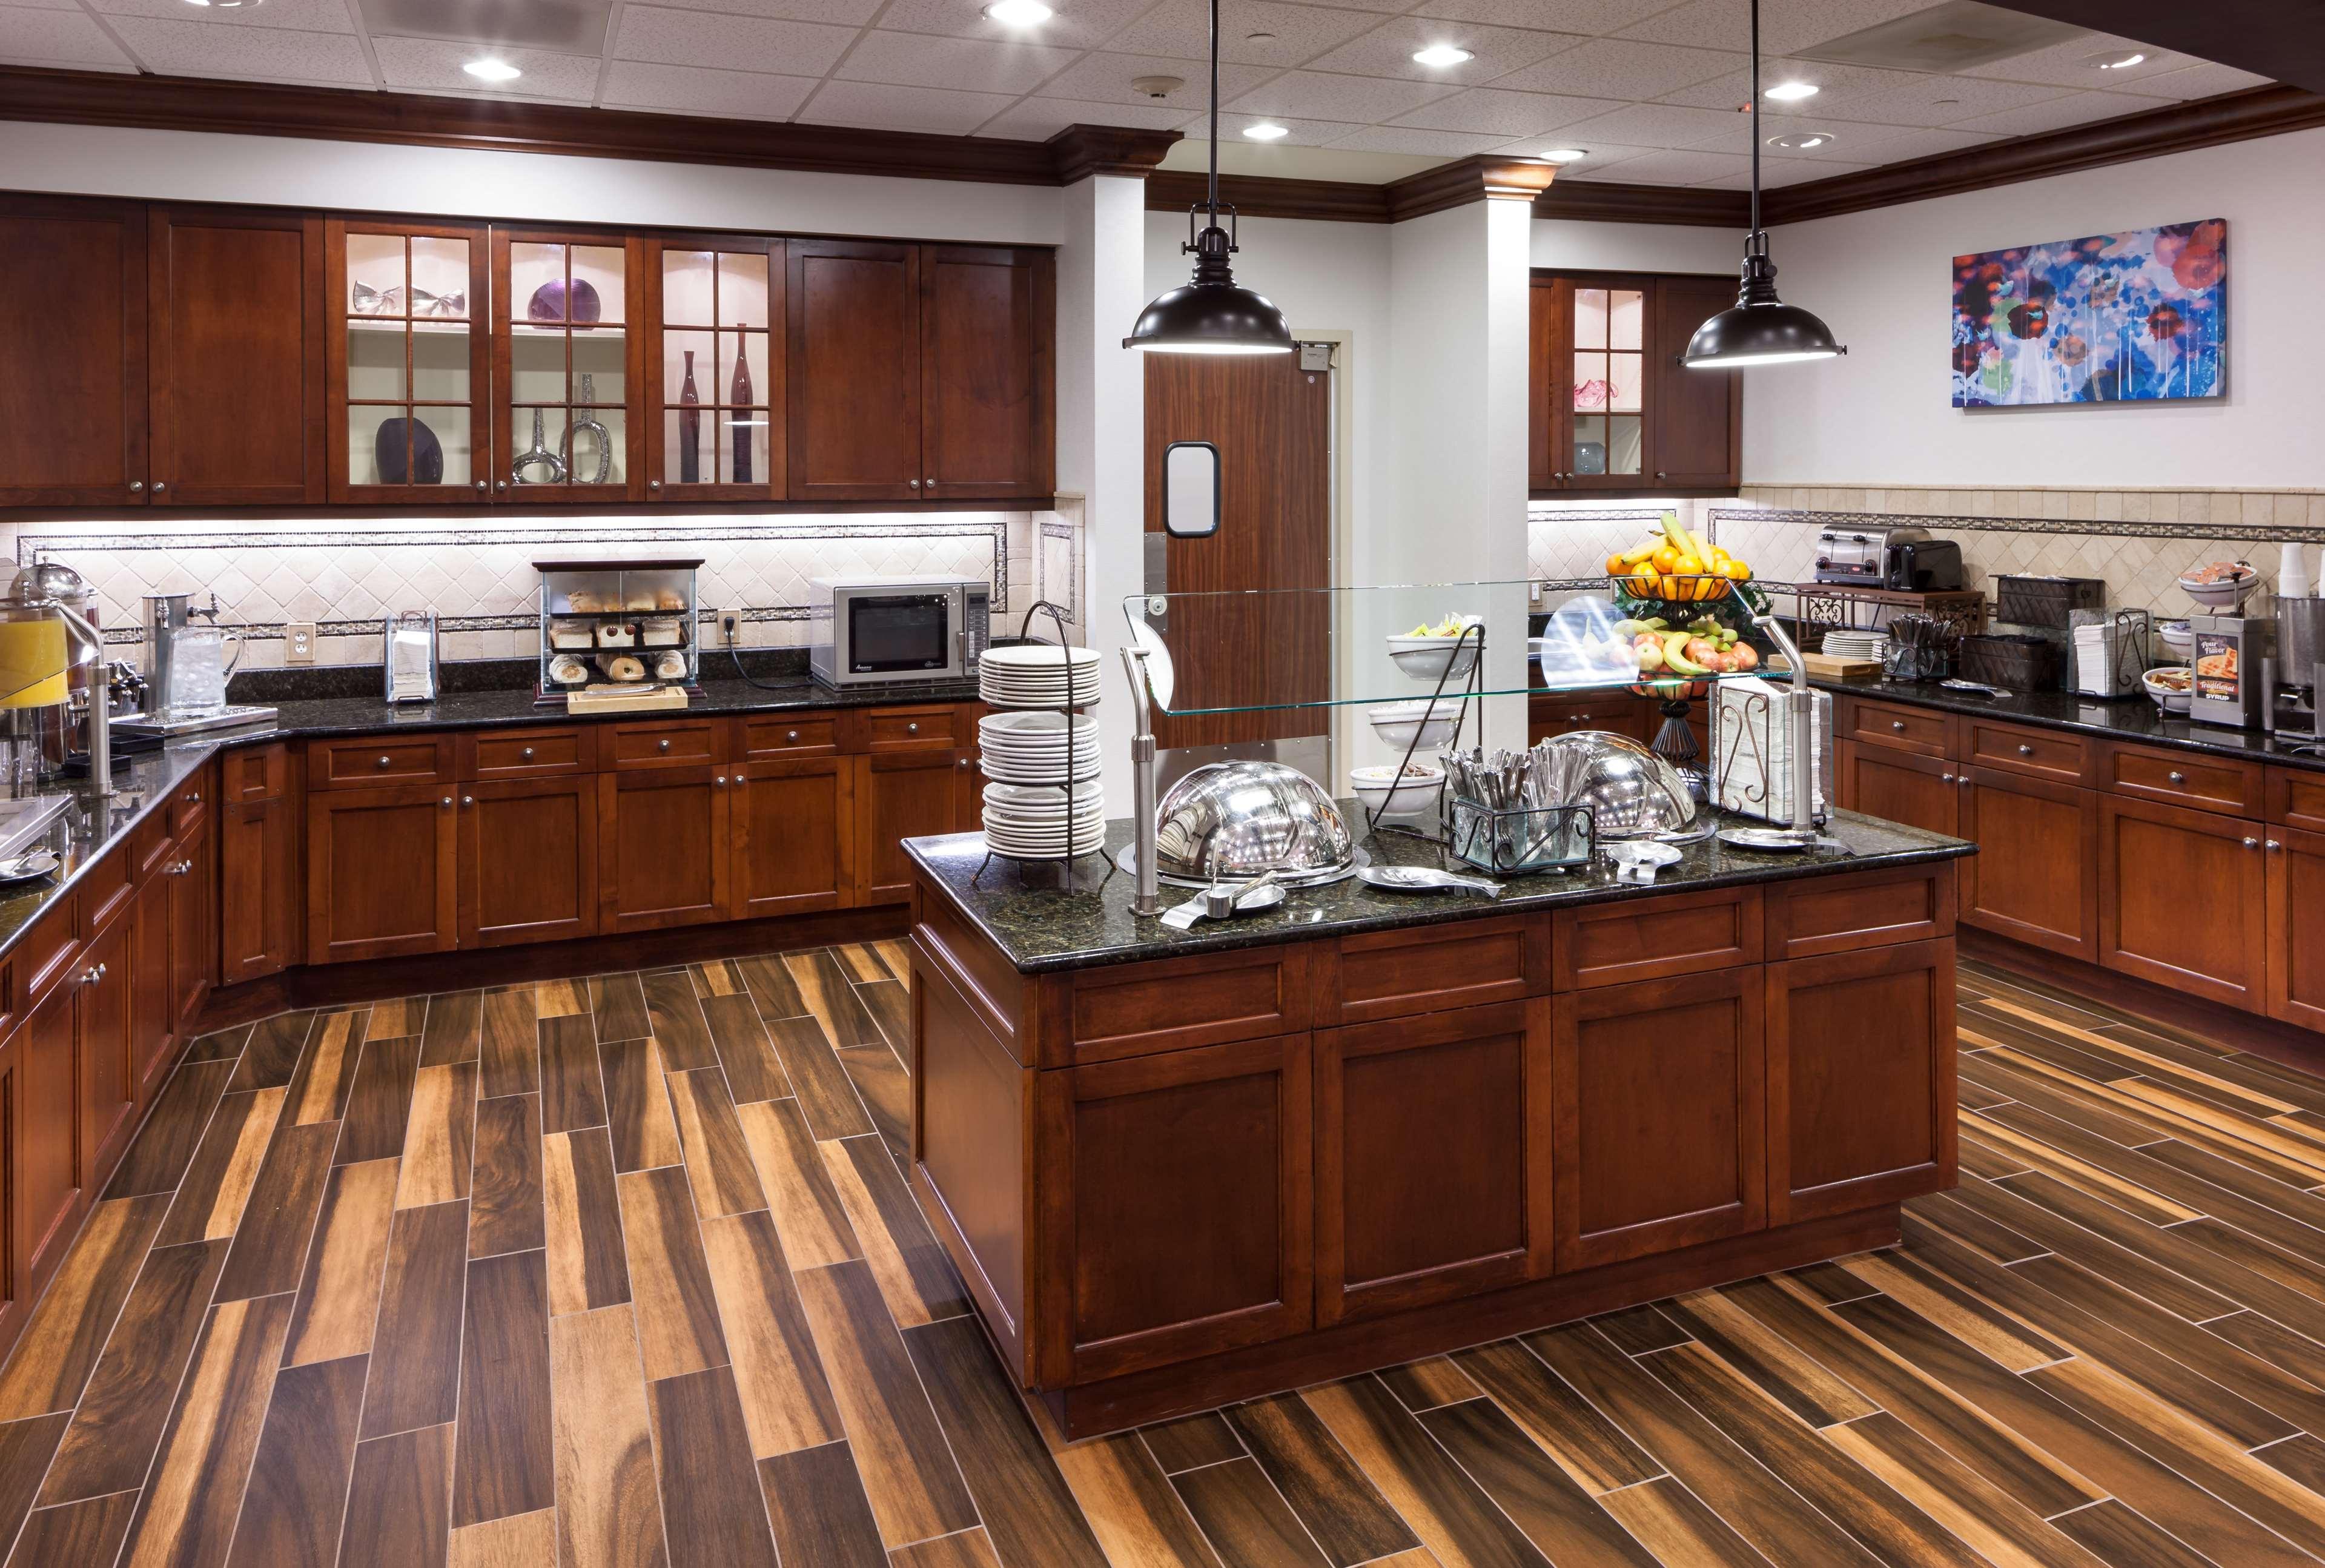 Homewood Suites by Hilton Denton image 11